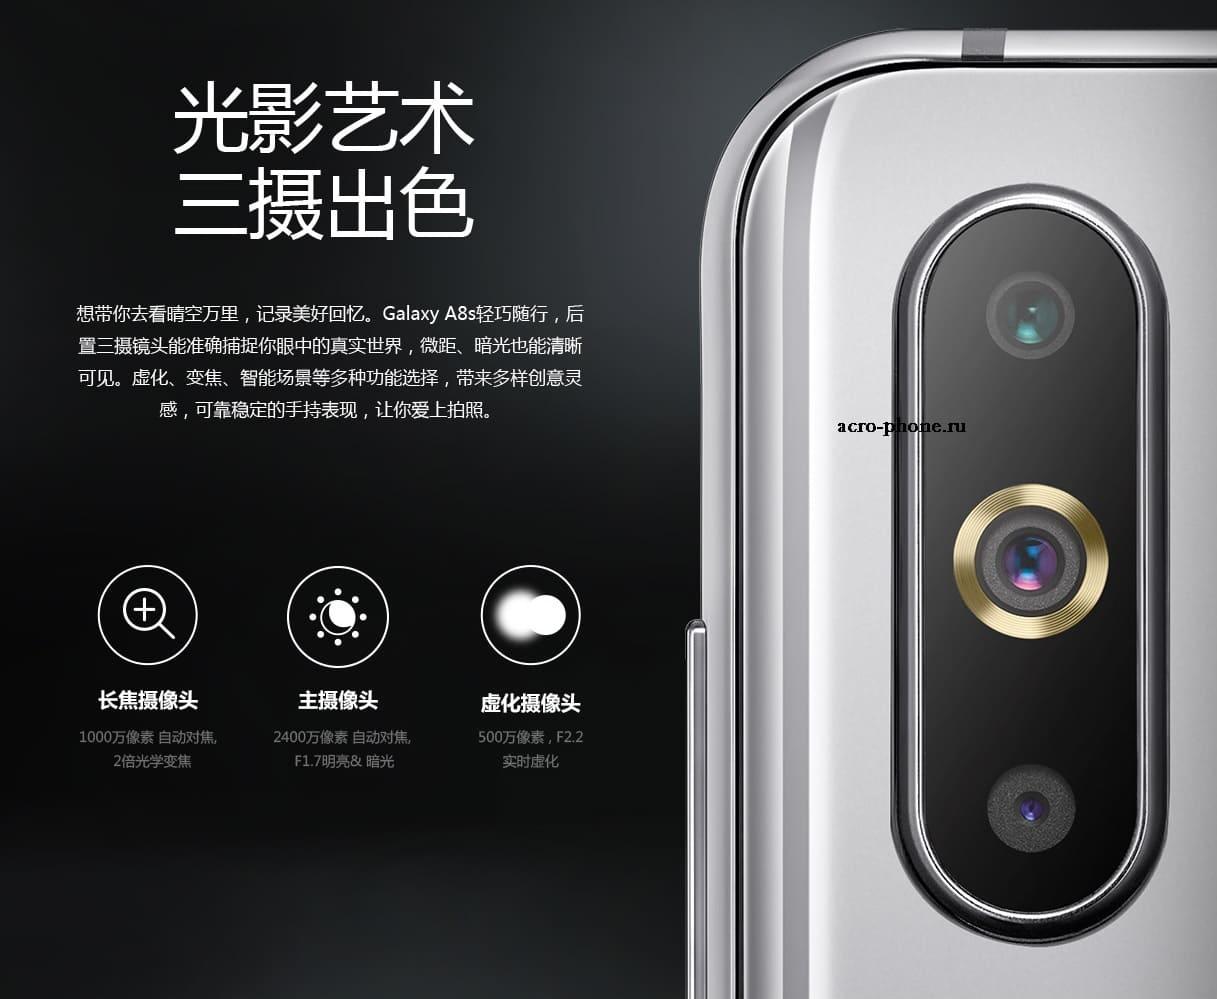 камера Galaxy A8s